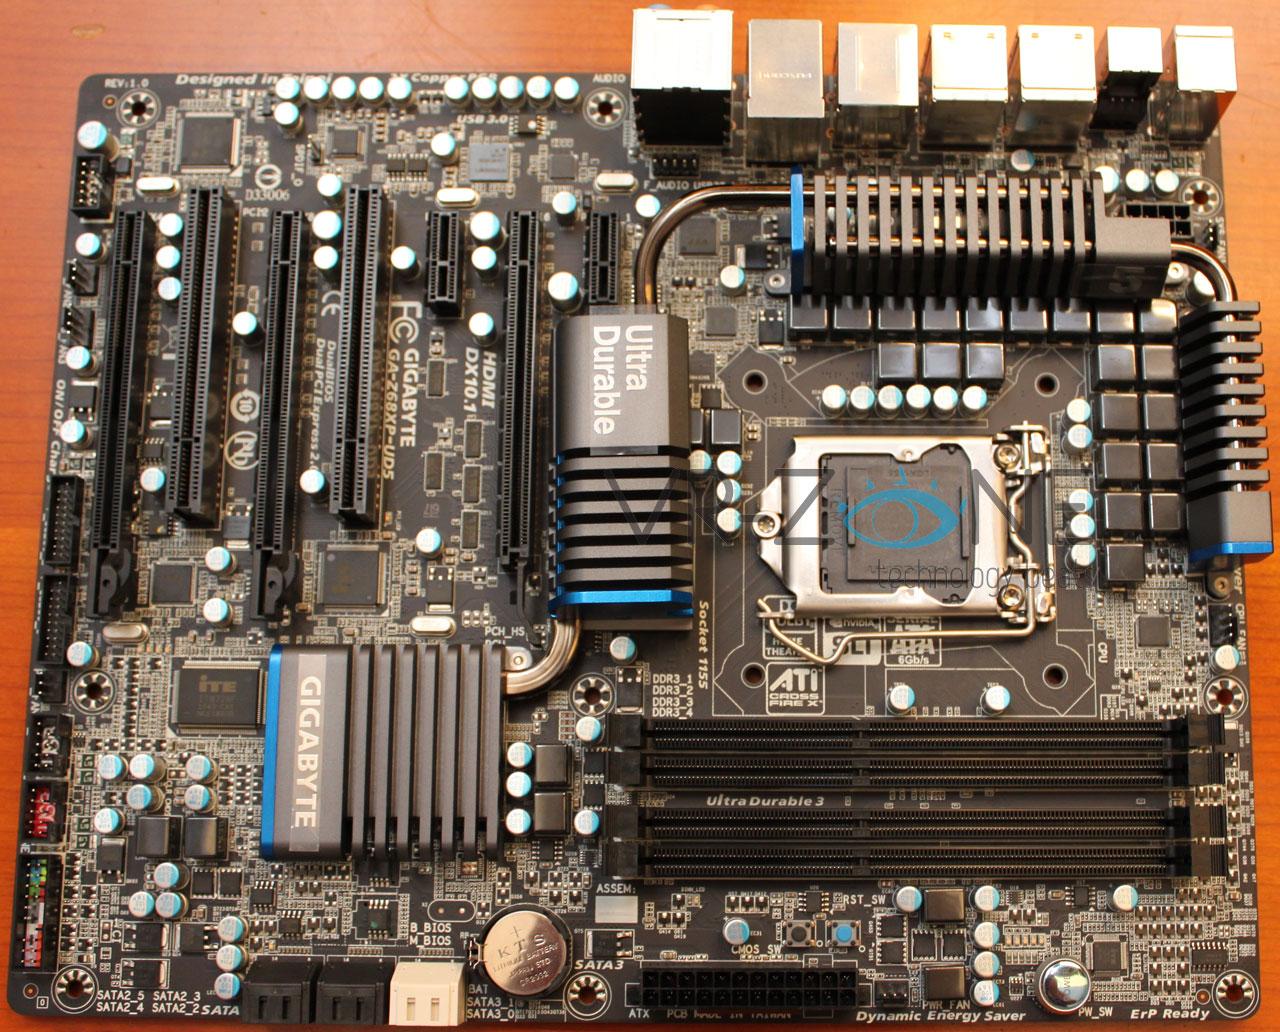 Gigabyte GA-Z68XP-UD5 Intel LGA 1155 motherboard